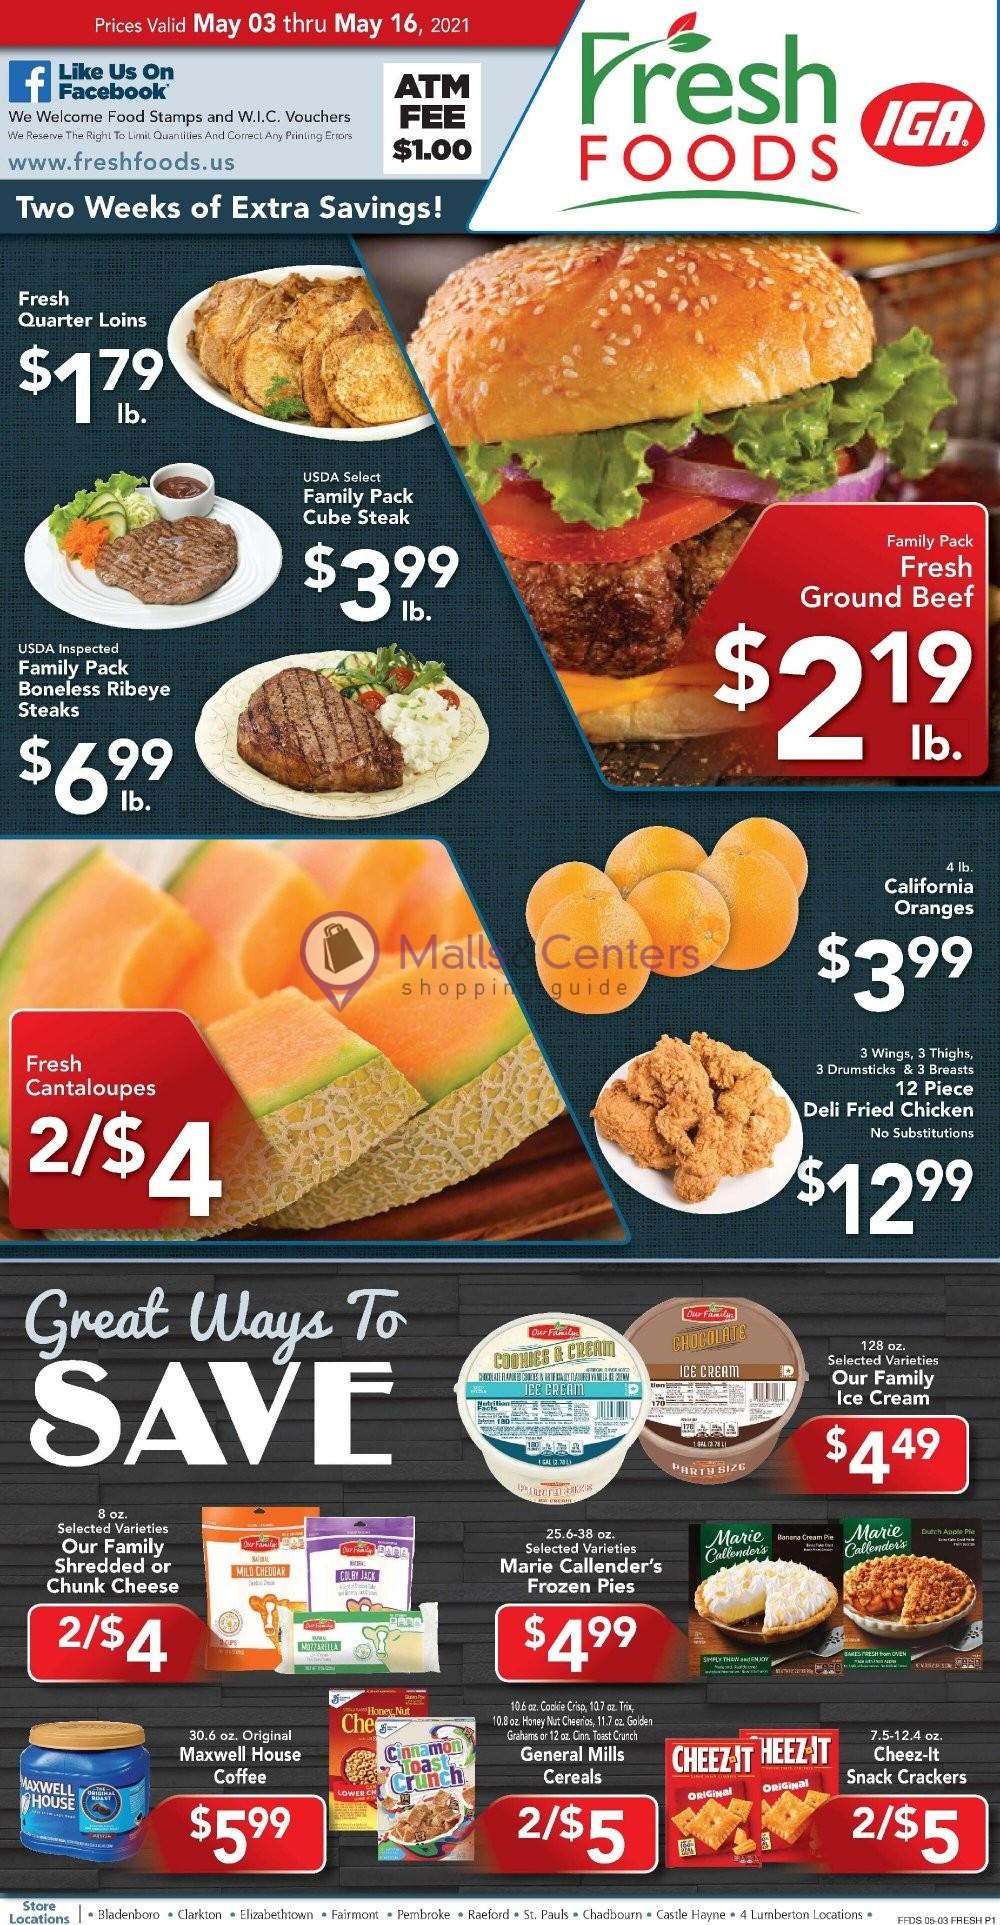 weekly ads Fresh Foods IGA - page 1 - mallscenters.com